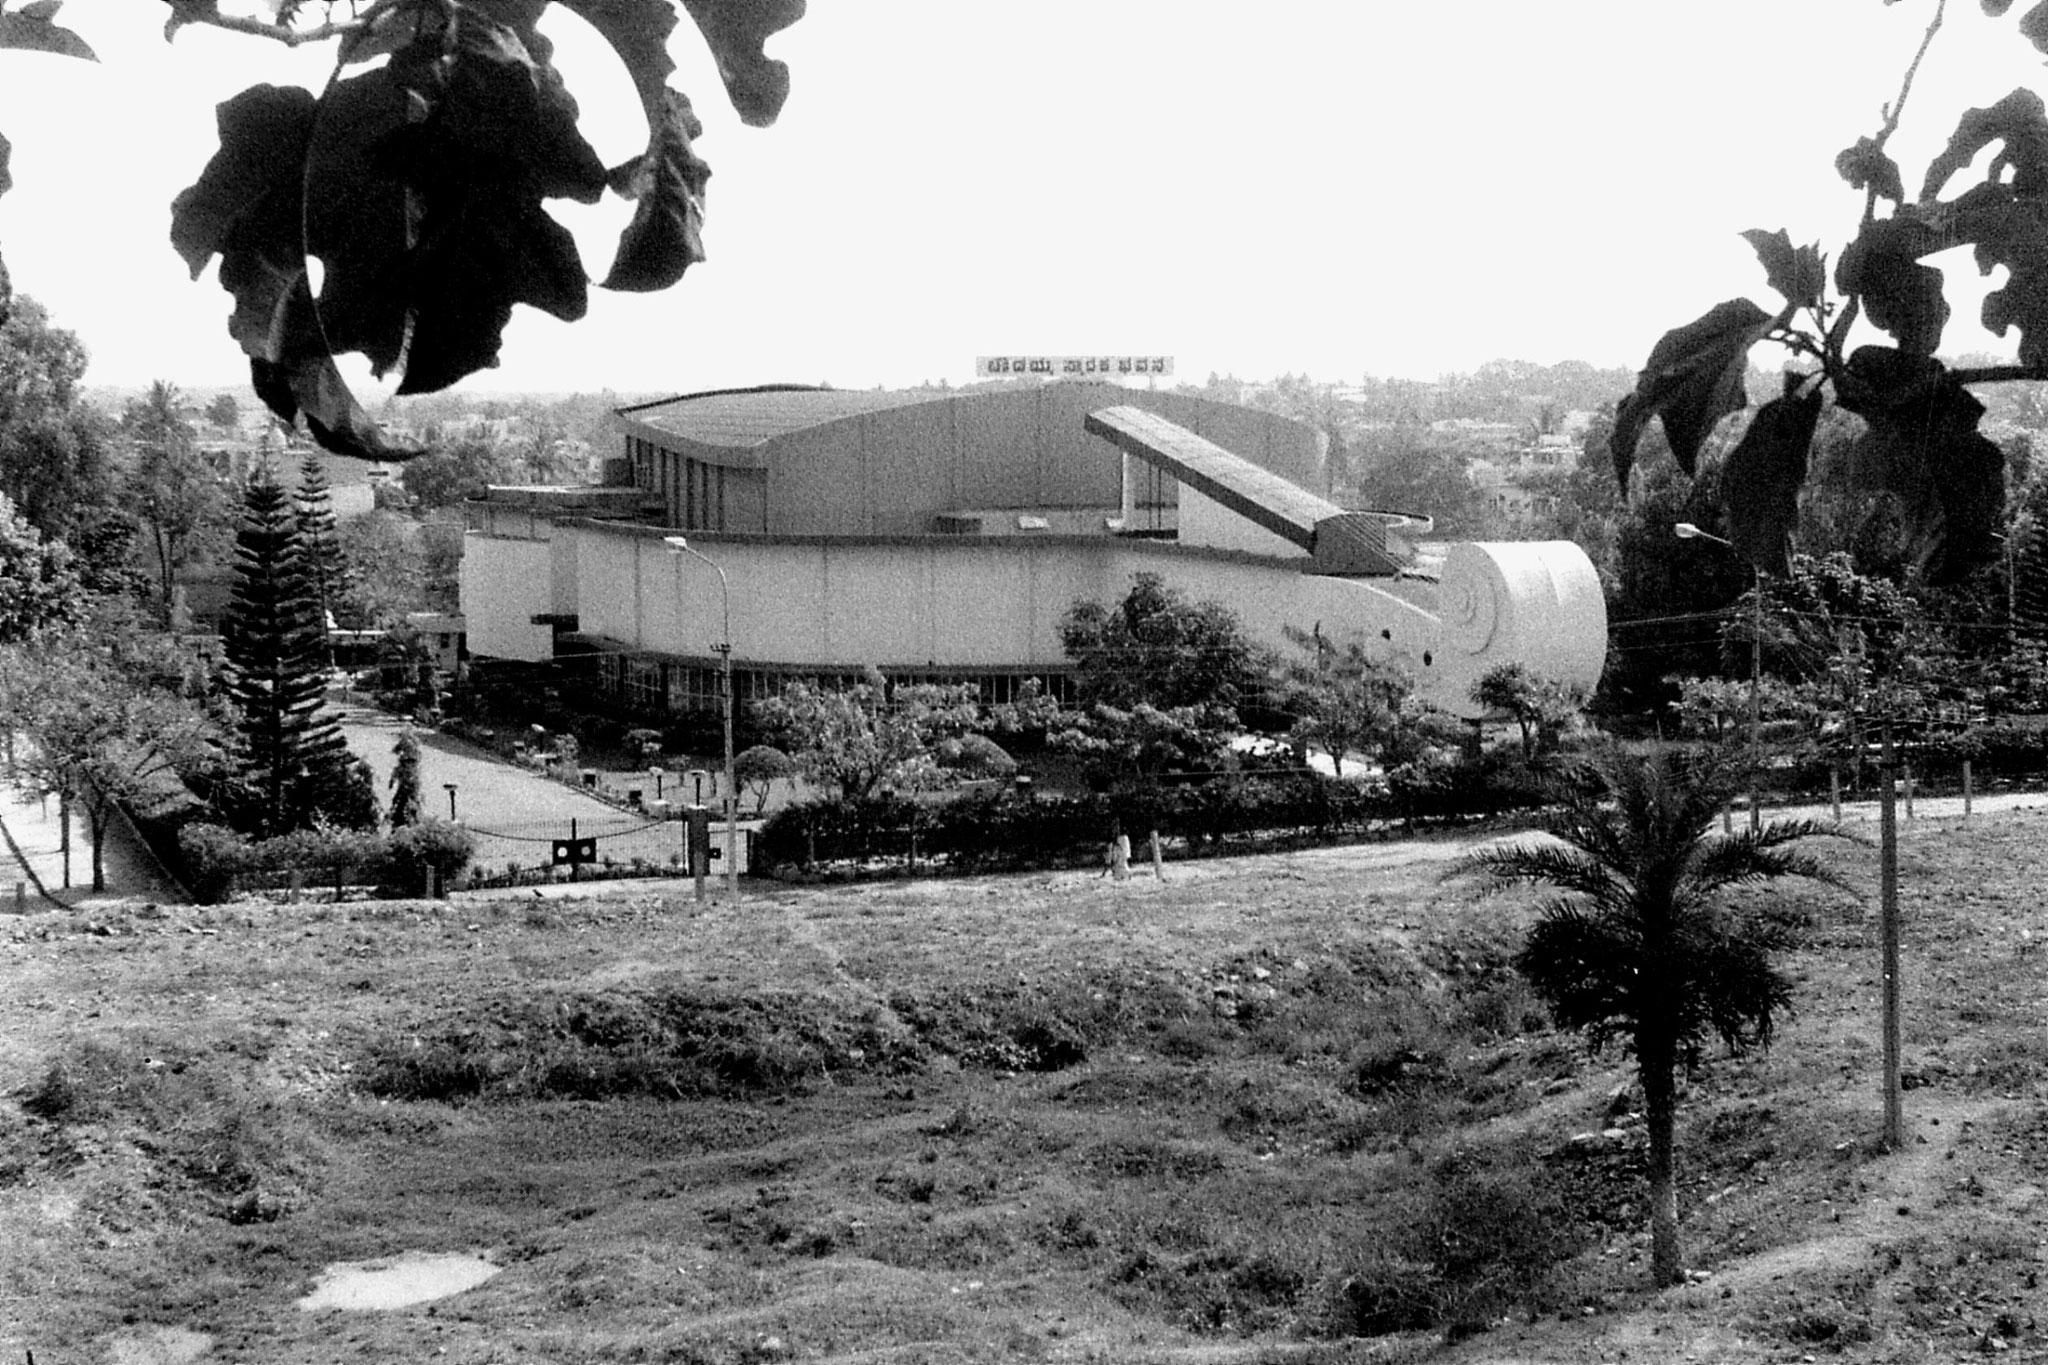 2/3/1990: 14: Bangalore Chowdiah Memorial Hall